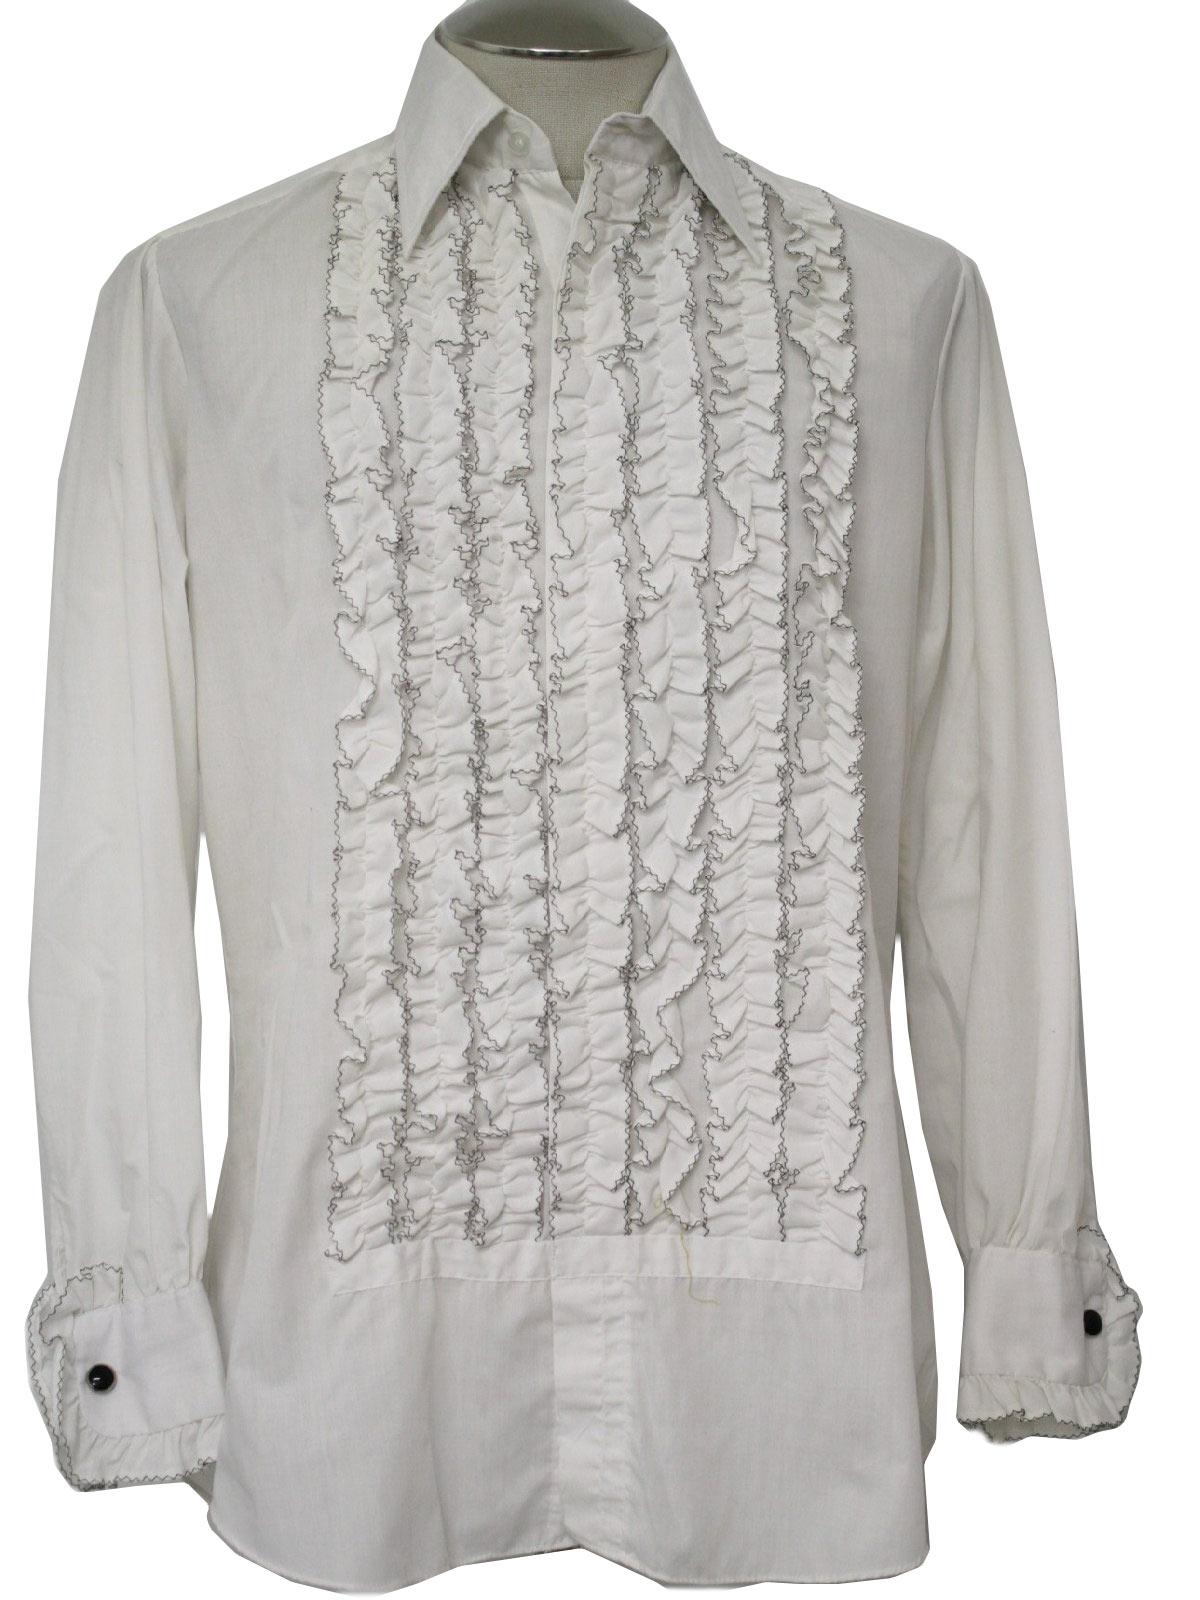 Retro Seventies Shirt 70s Monte Carlo Mens White